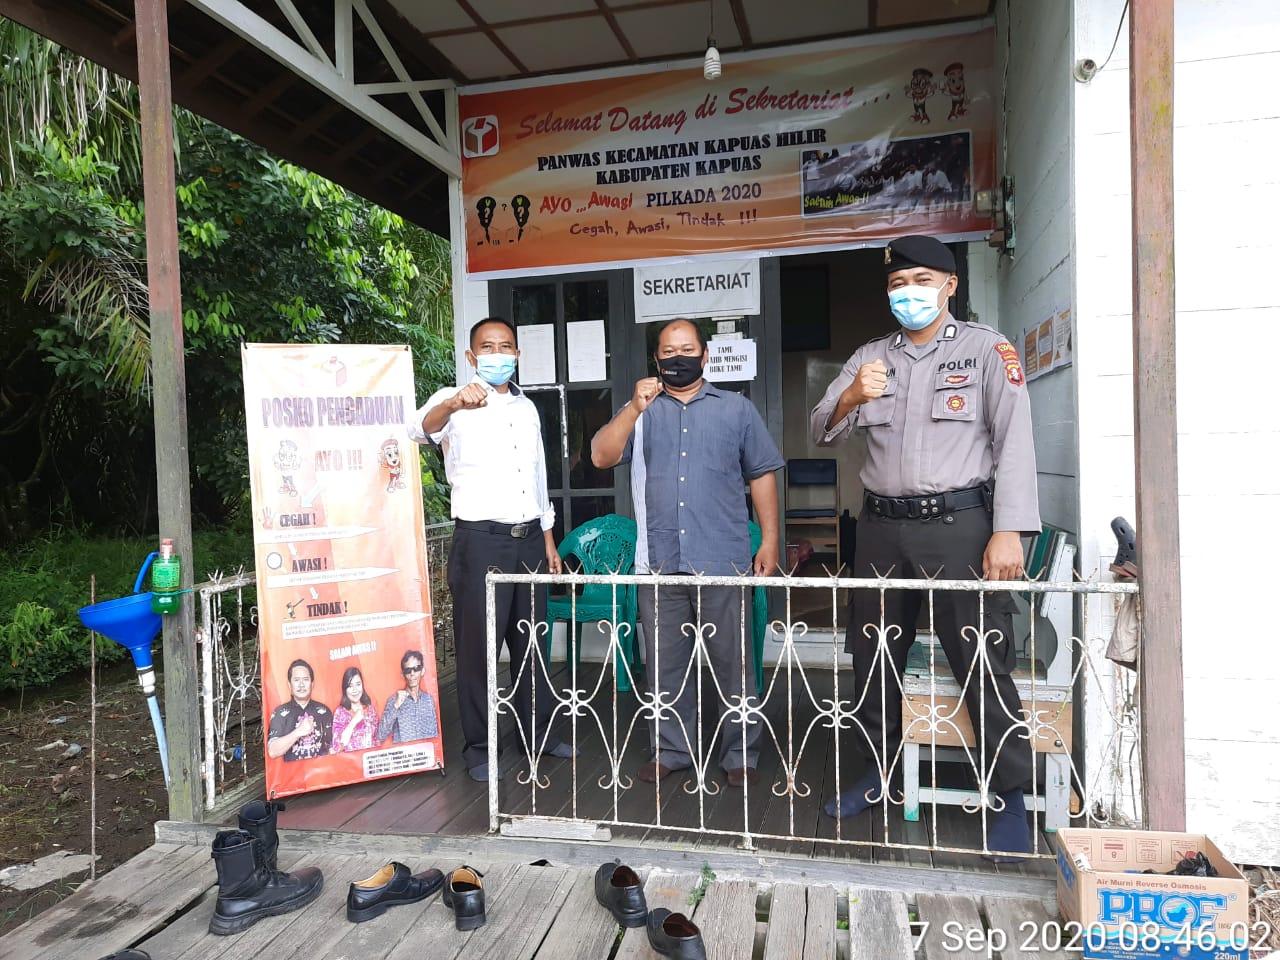 Piket Polsek Kapuas Hilir Laksanakan Patroli Sambang Ke Kantor Panwas